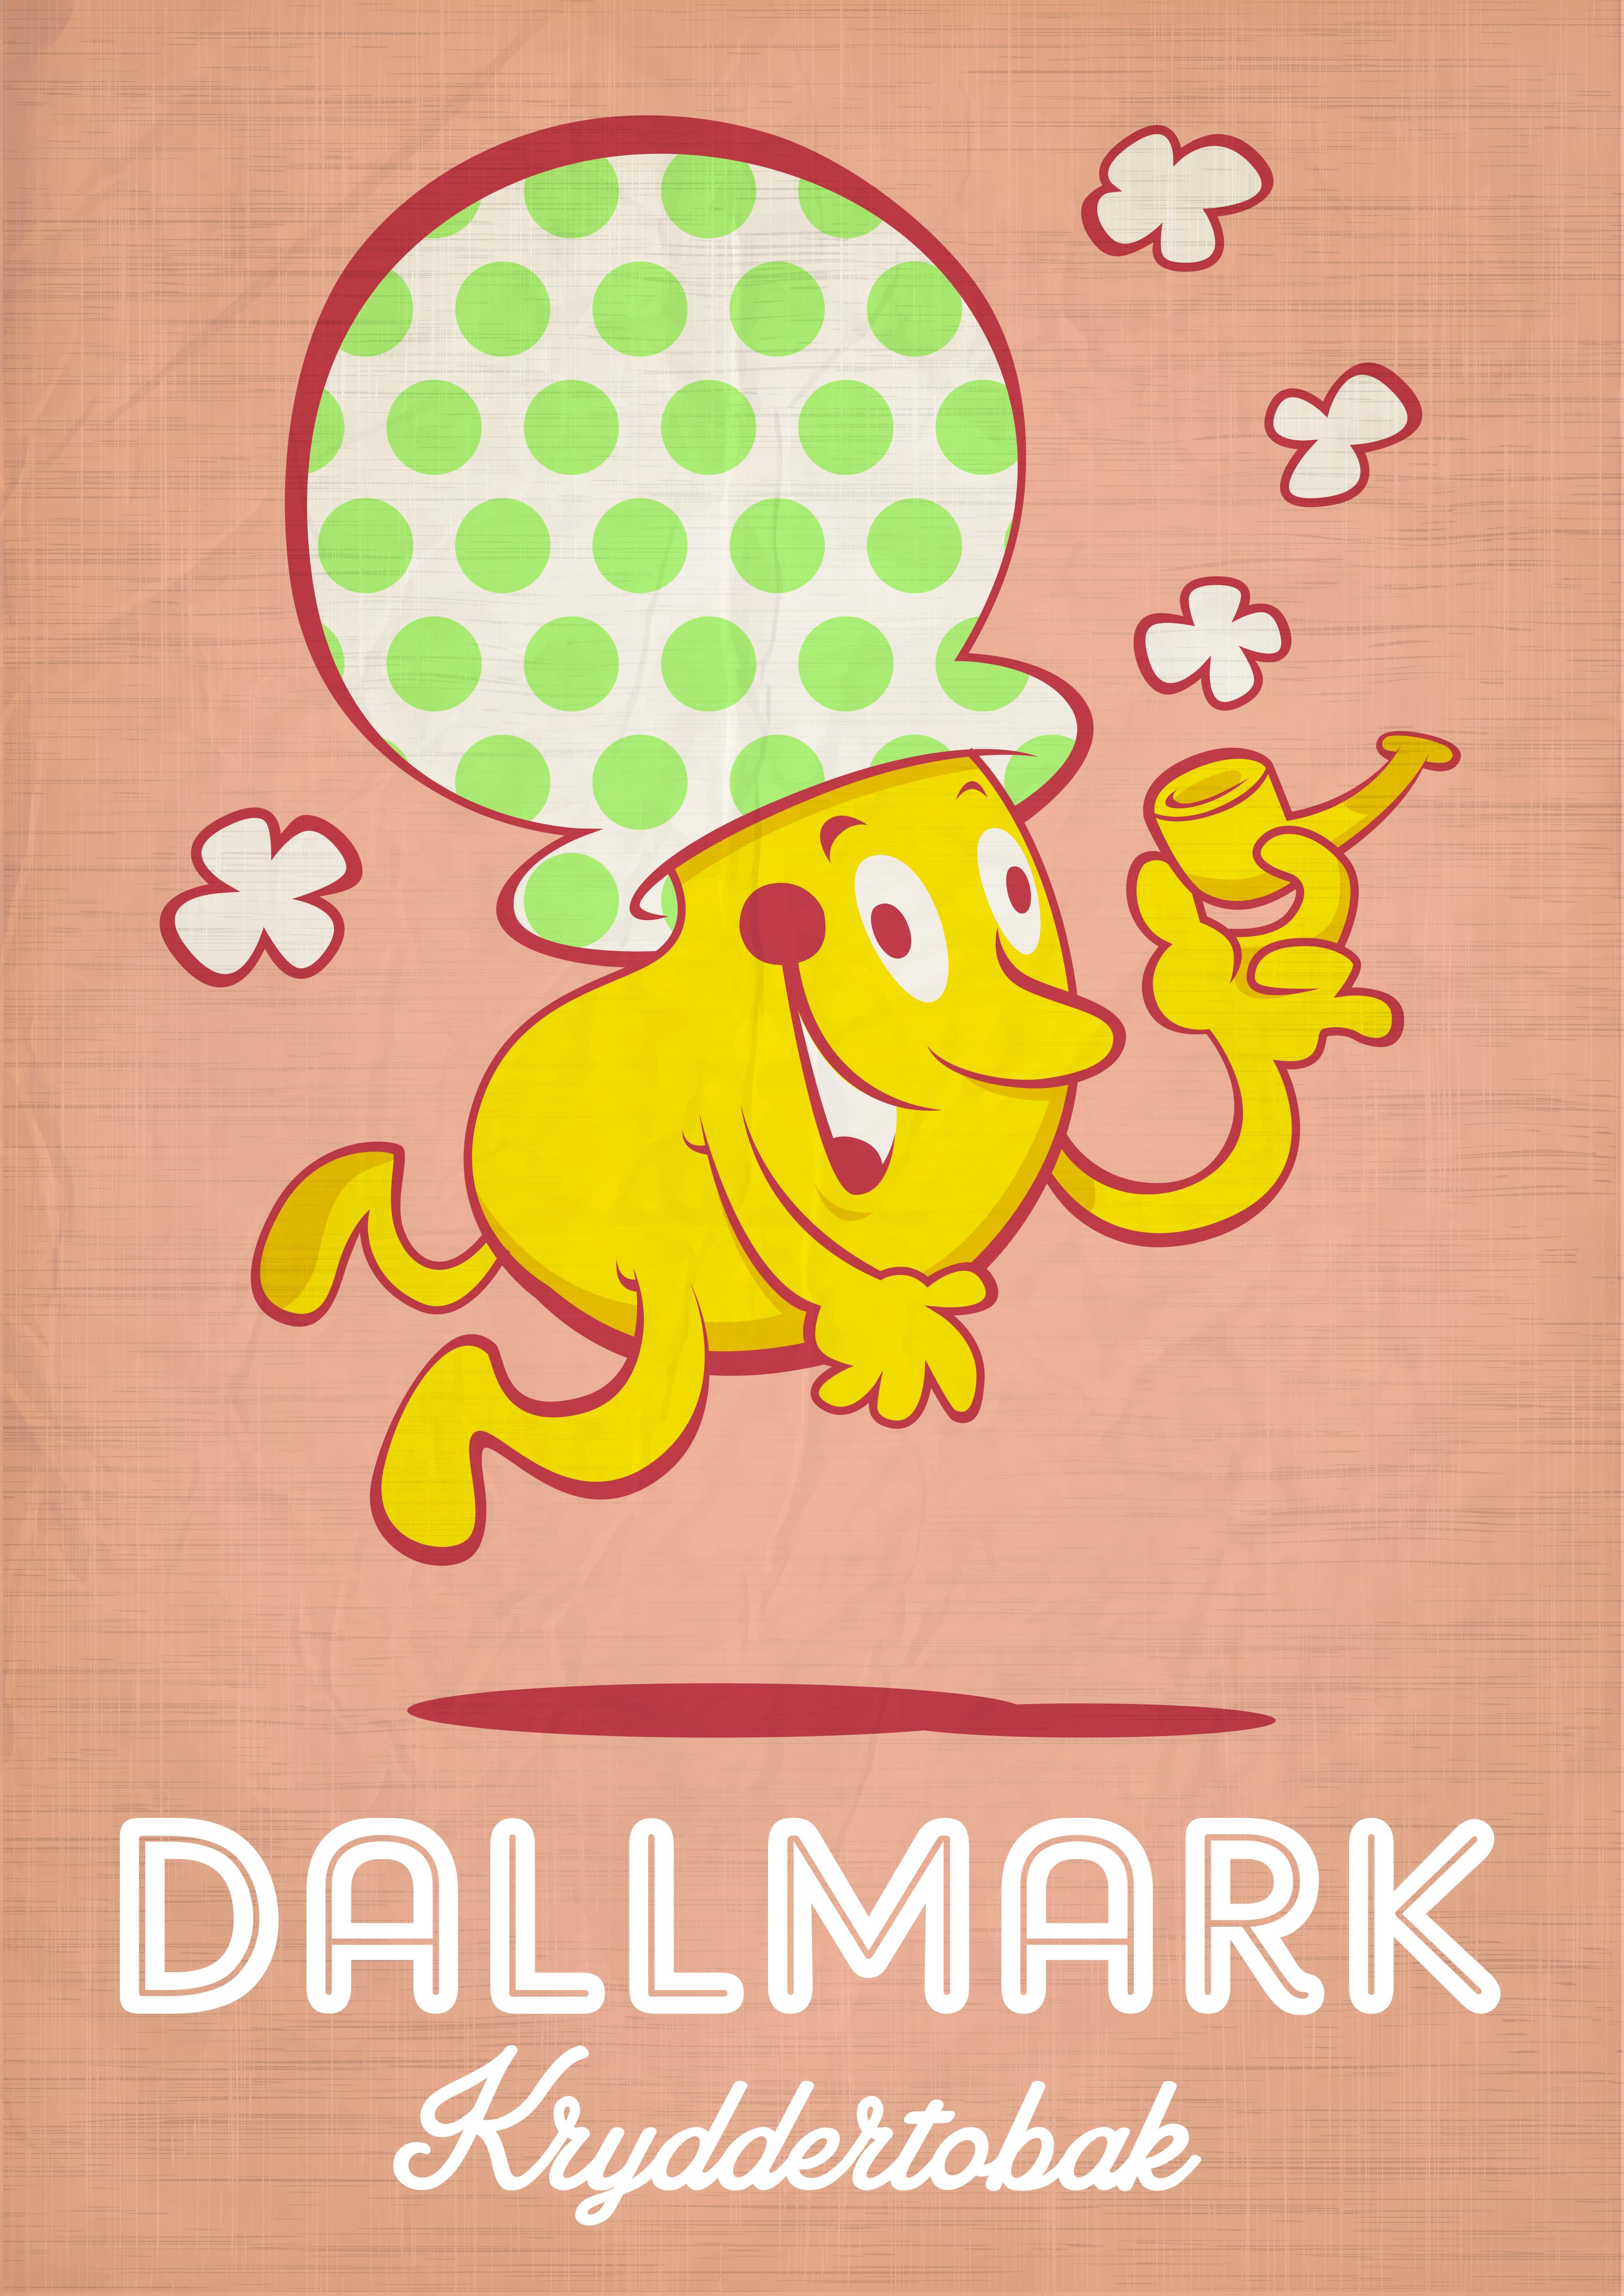 Dallmark_tobak_poster